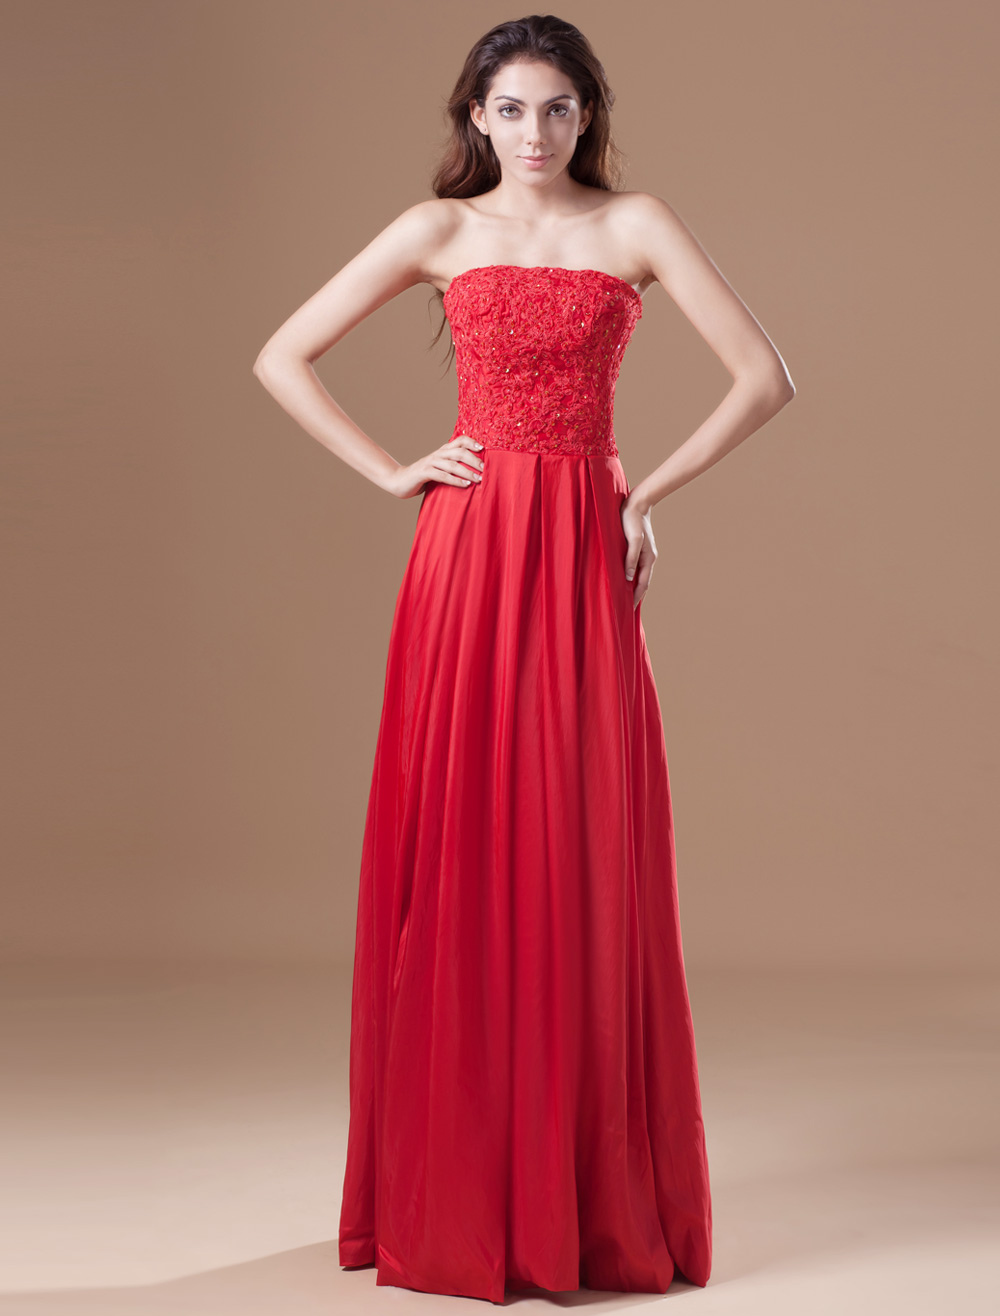 Elegant Red Taffeta Sequin Strapless Women's Evening Dress (Wedding Cheap Party Dress) photo